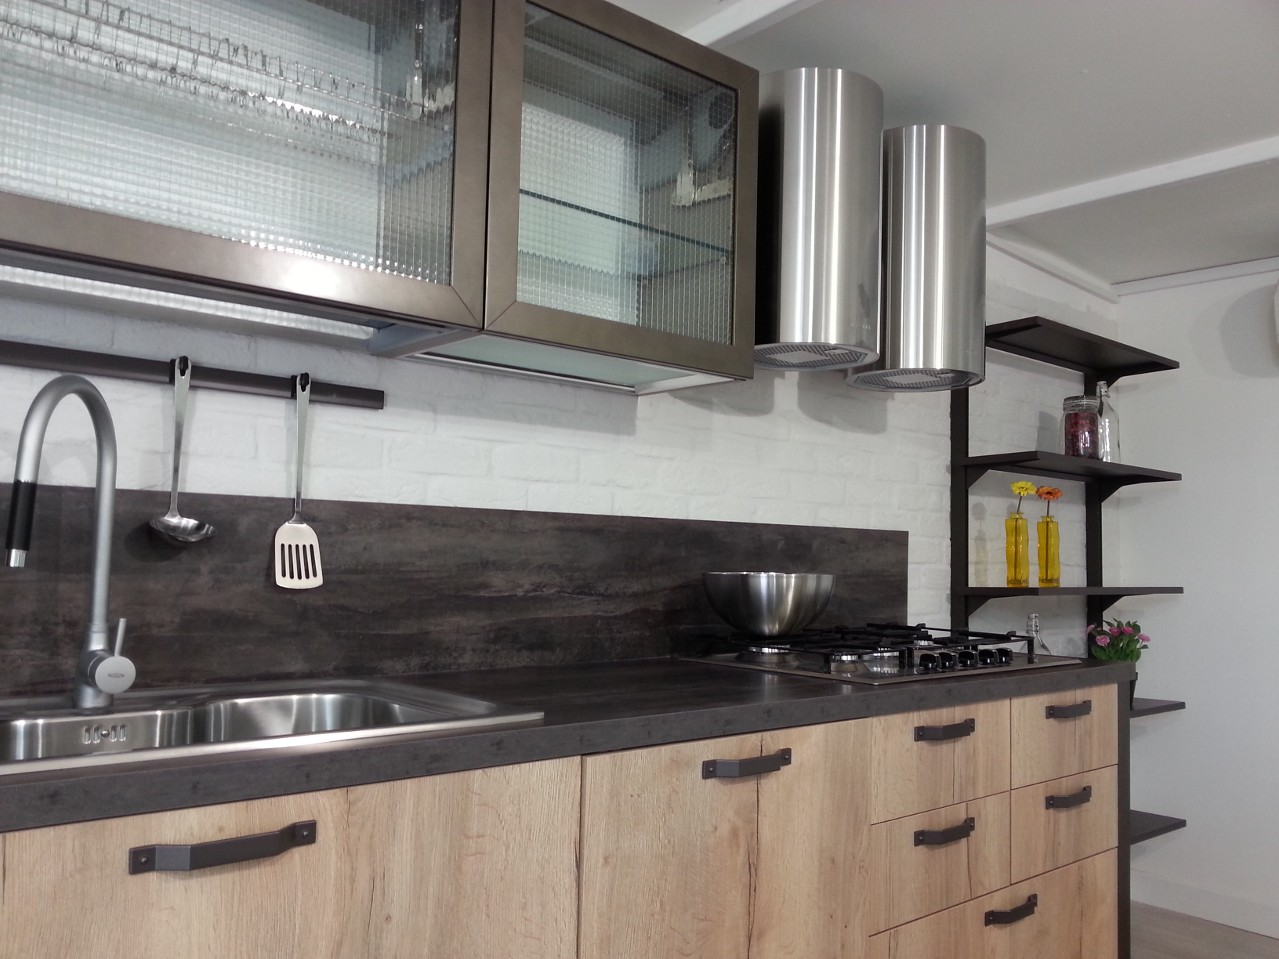 Cucina mattone b trep rm 1 rinnovare con la pietra - Rivestimento cucina finta pietra ...